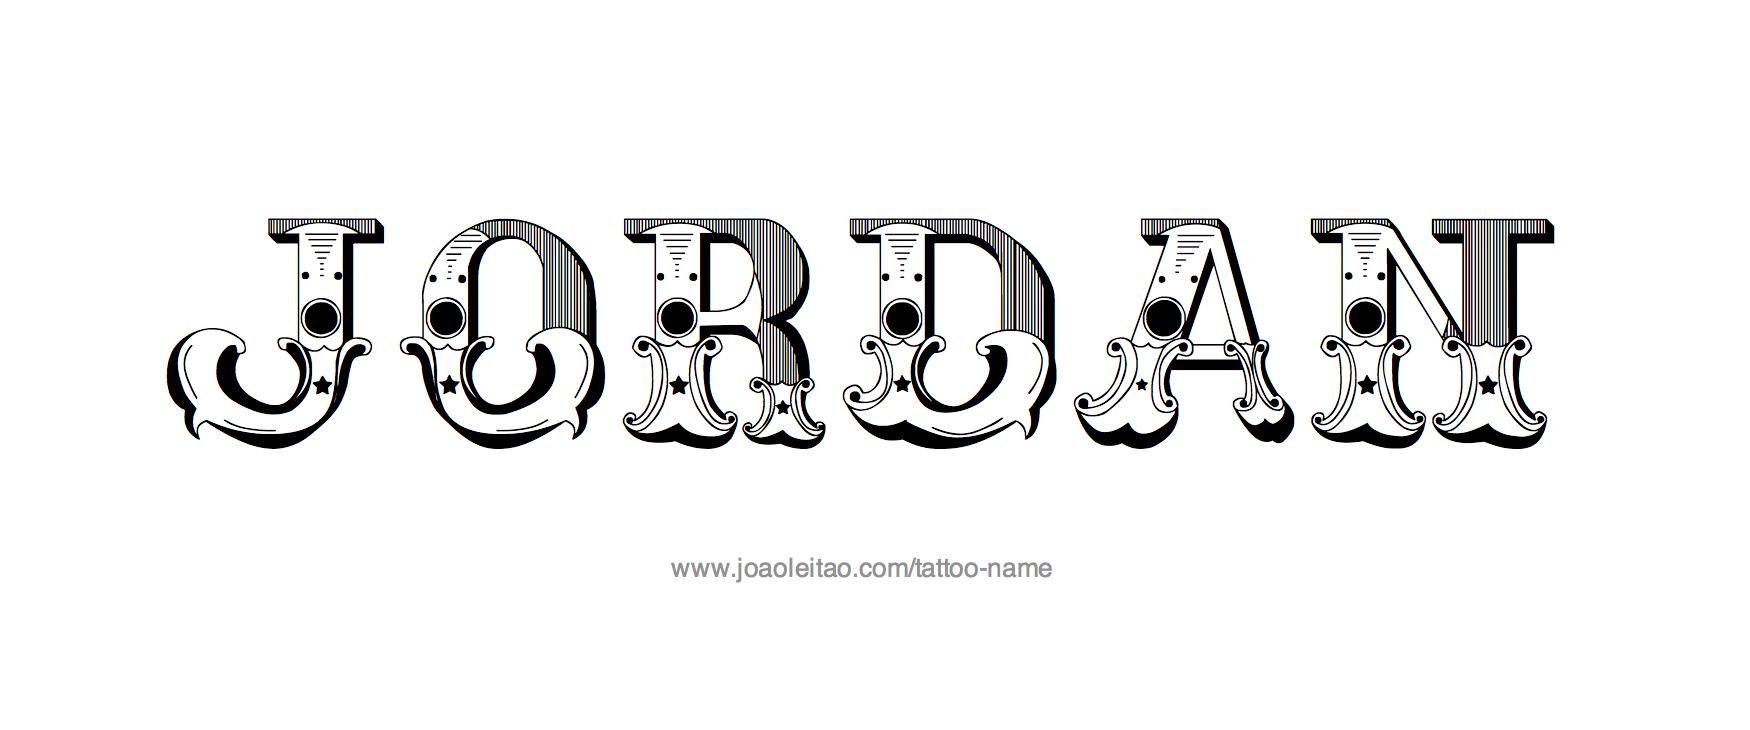 Name tattoo designs free -  Jordan Name Tattoo Designs